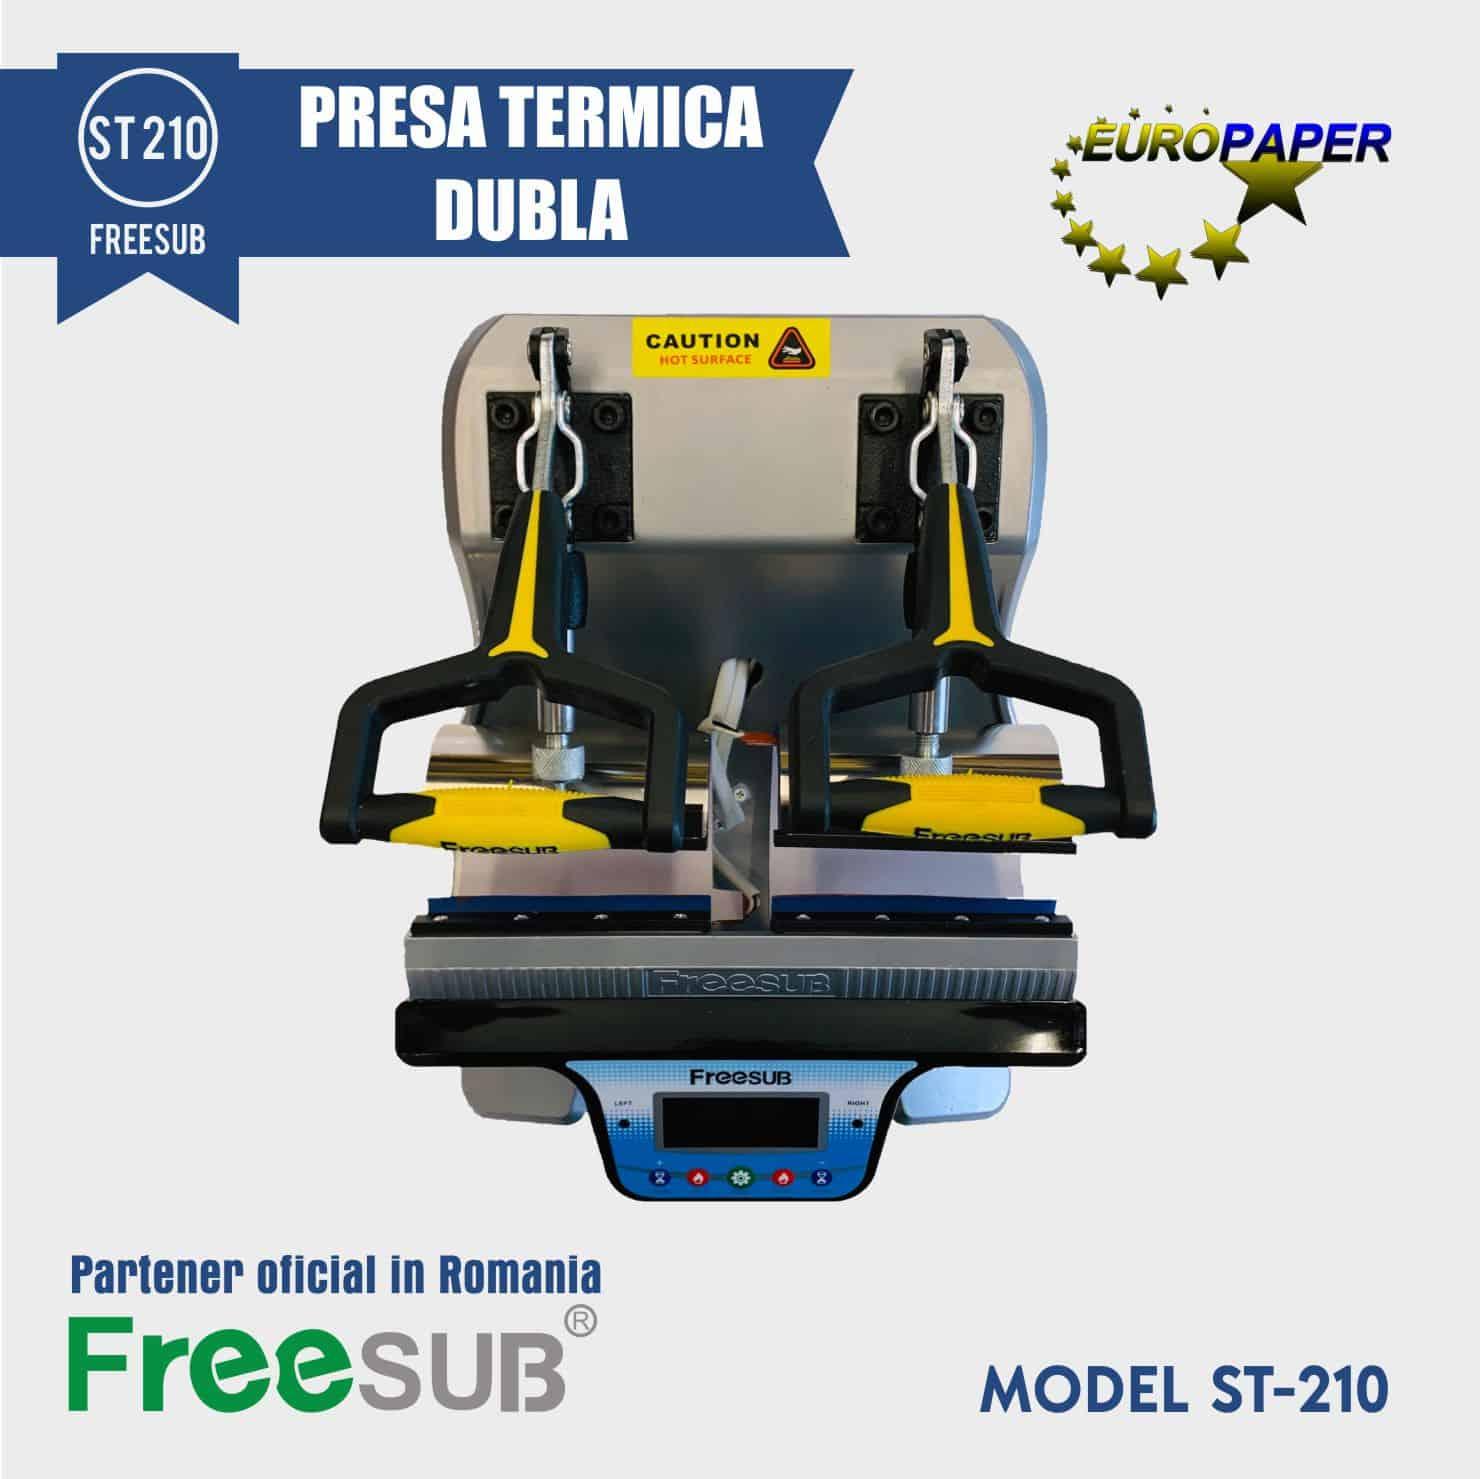 PRESA TERMICA DUBLA ST 210